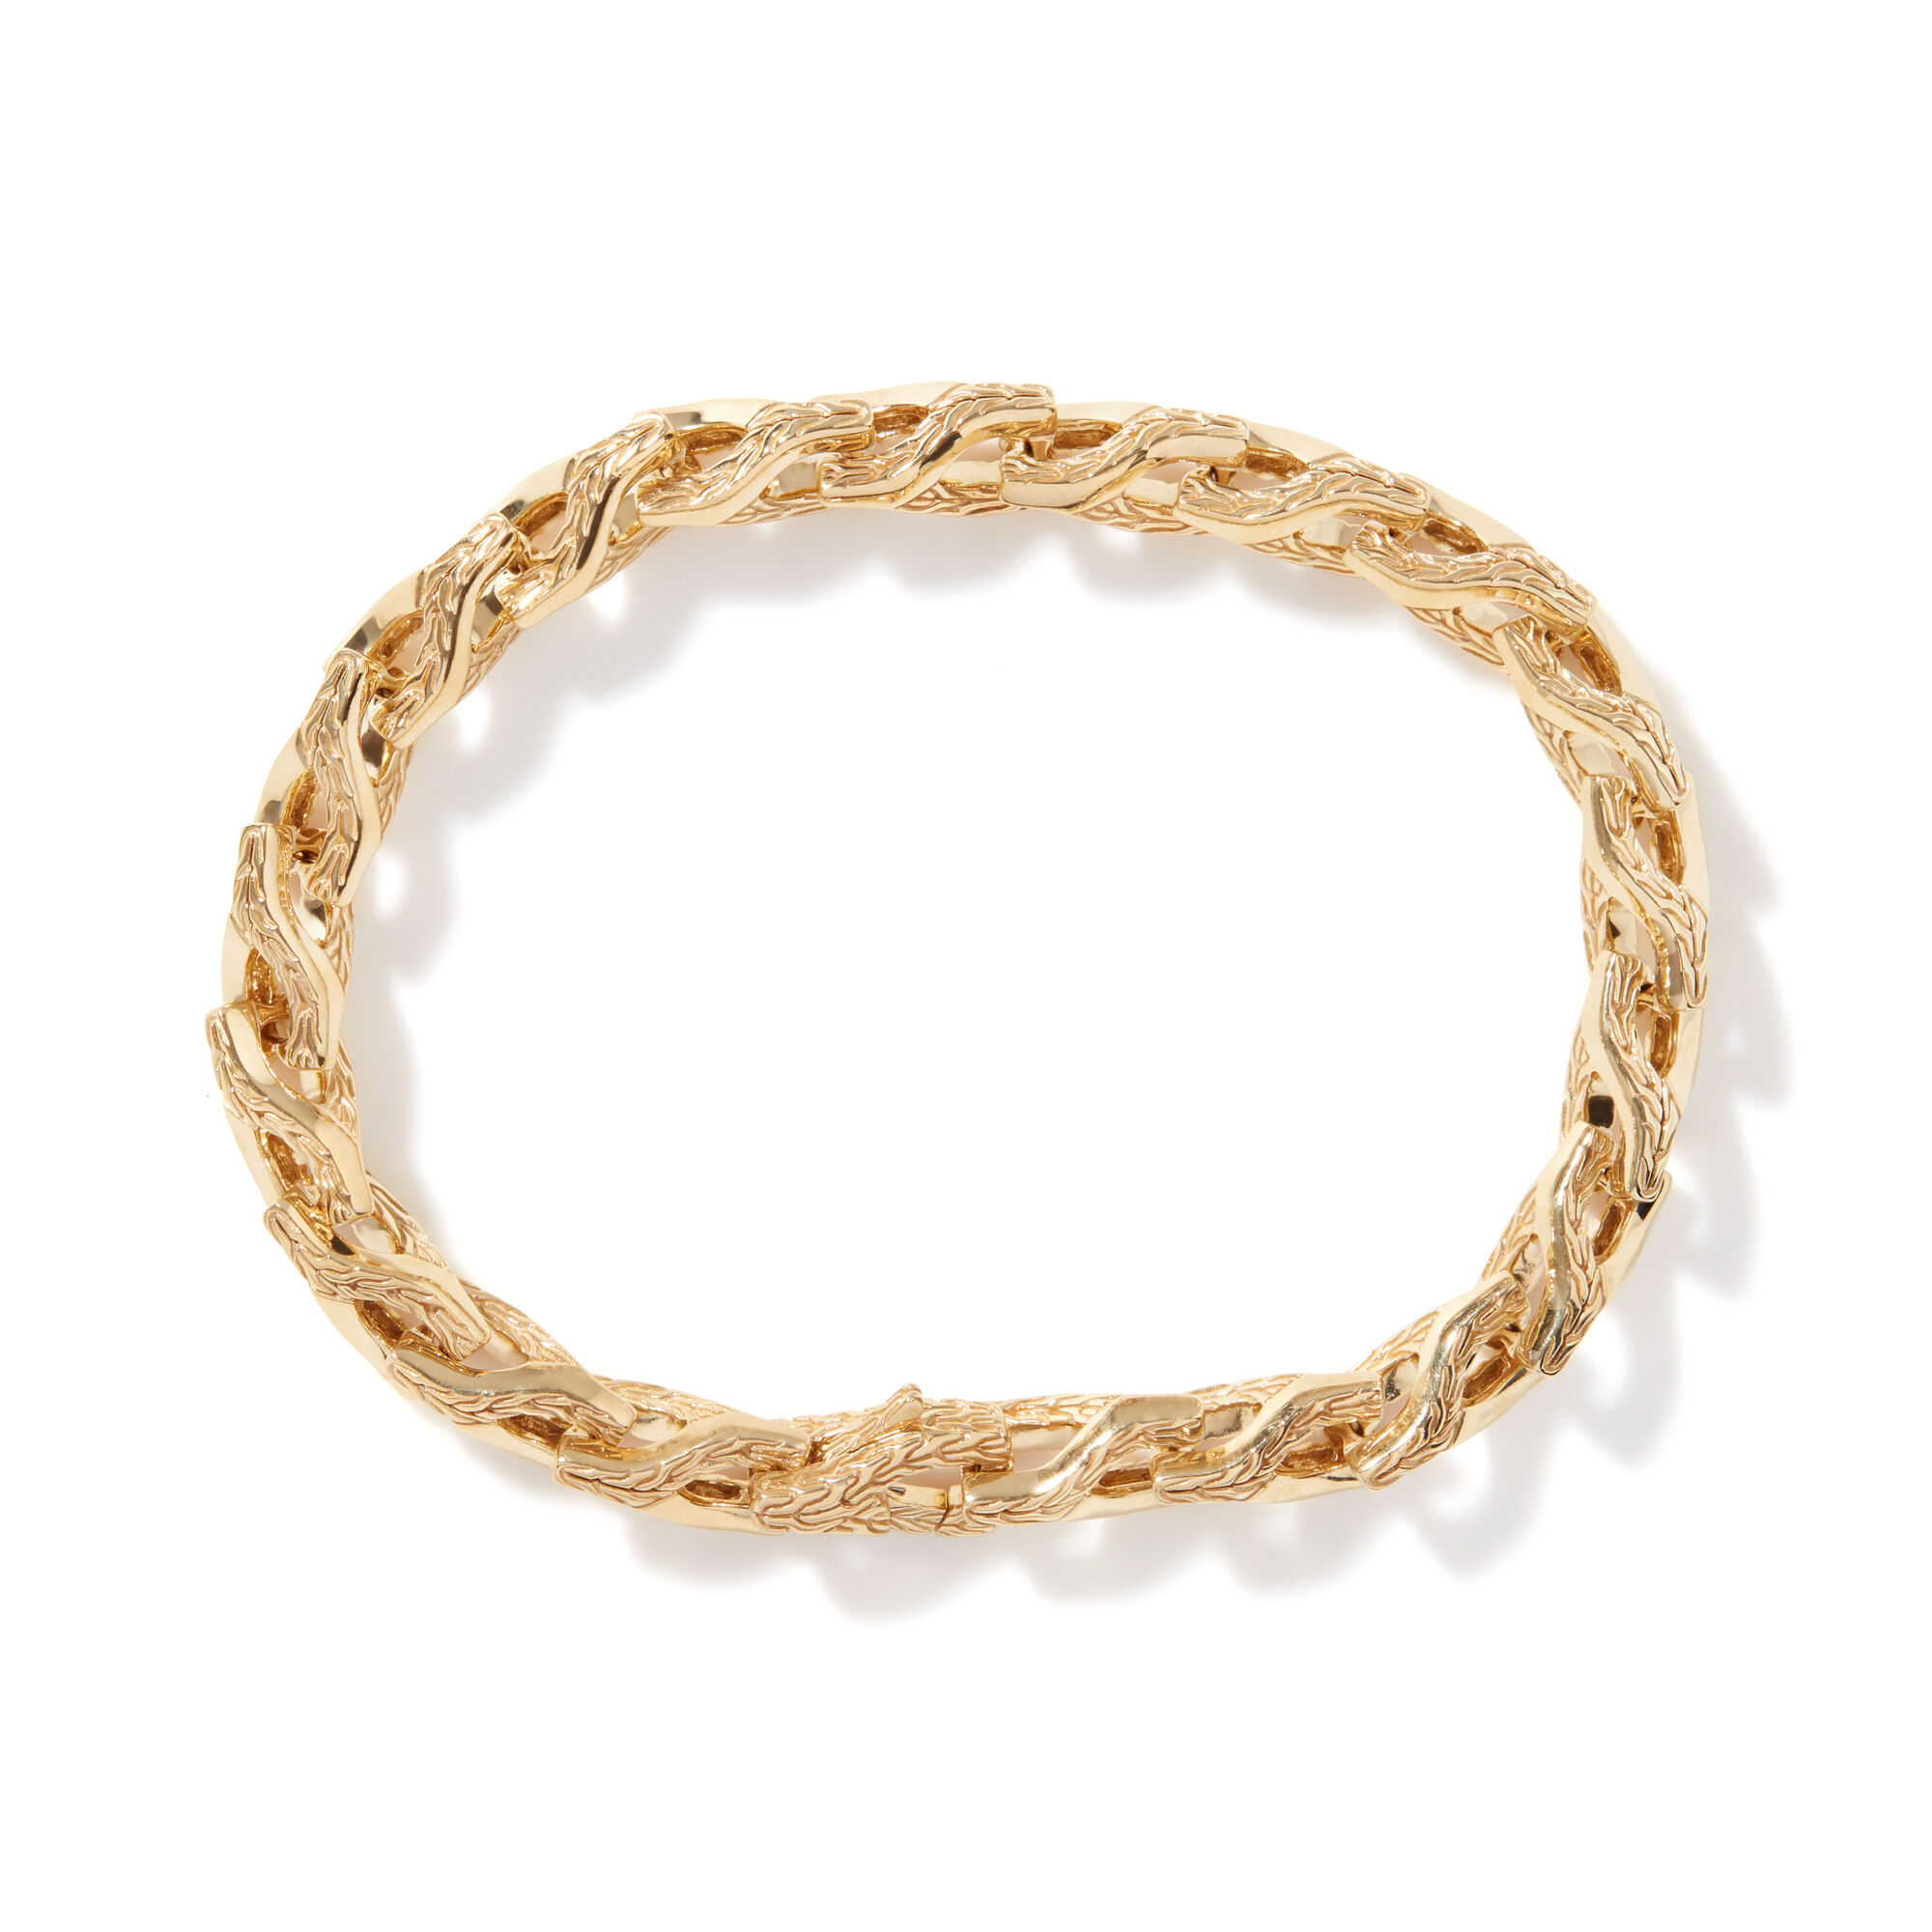 Asli Classic Chain Link Bracelet in 18K Gold, , large